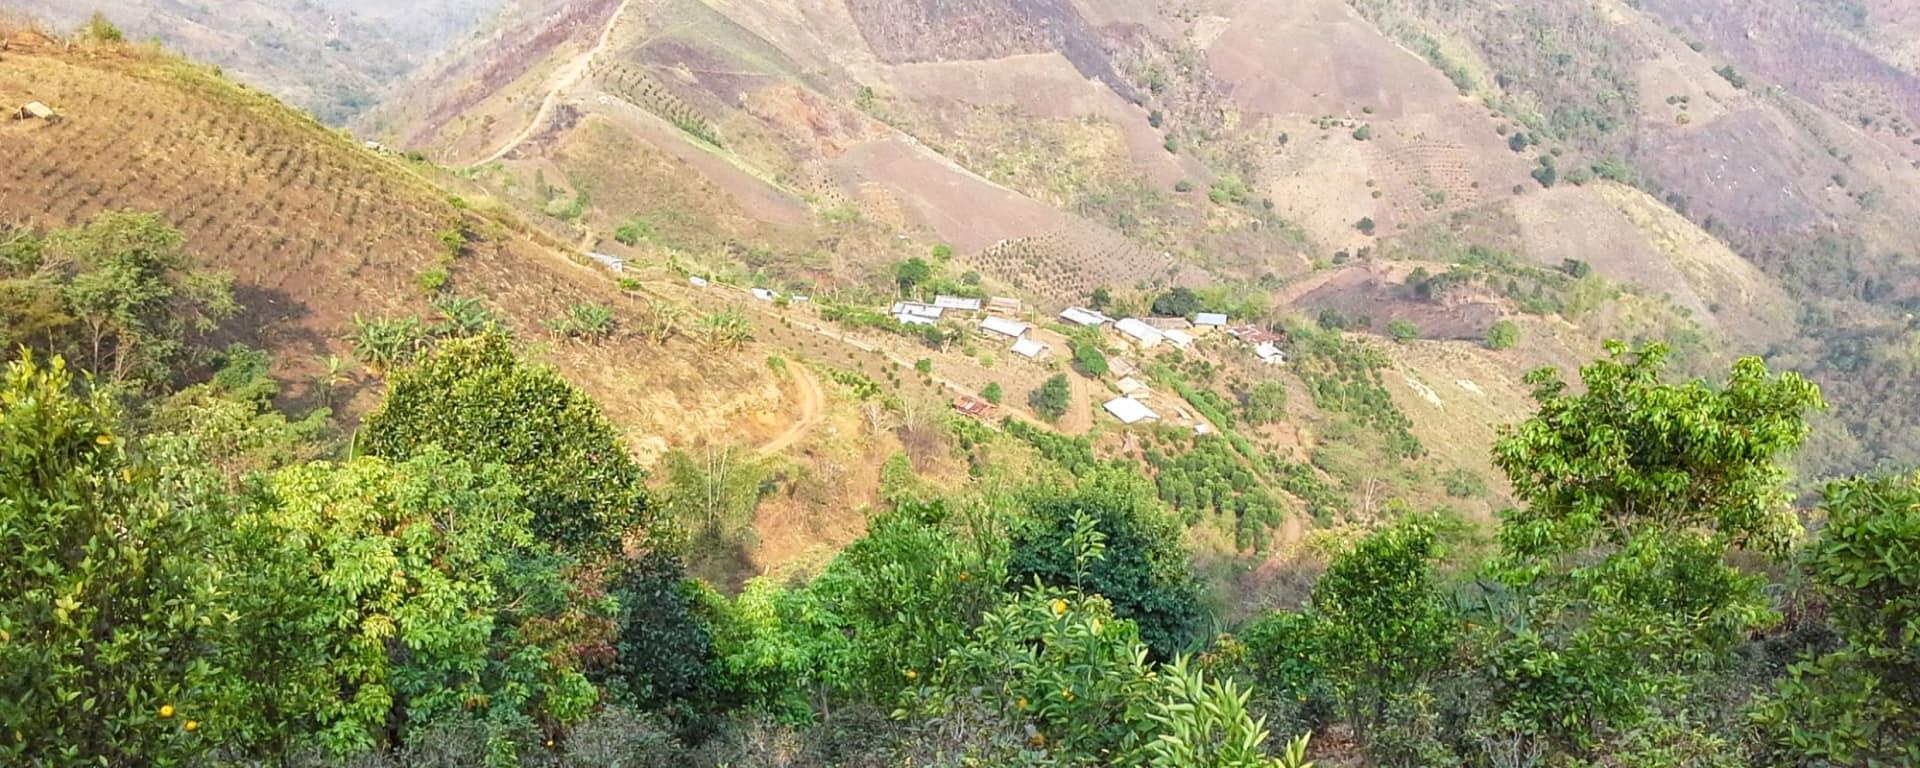 Wandern im malerischen Shan Staat (4 Tage) ab Inle Lake: Community Trail